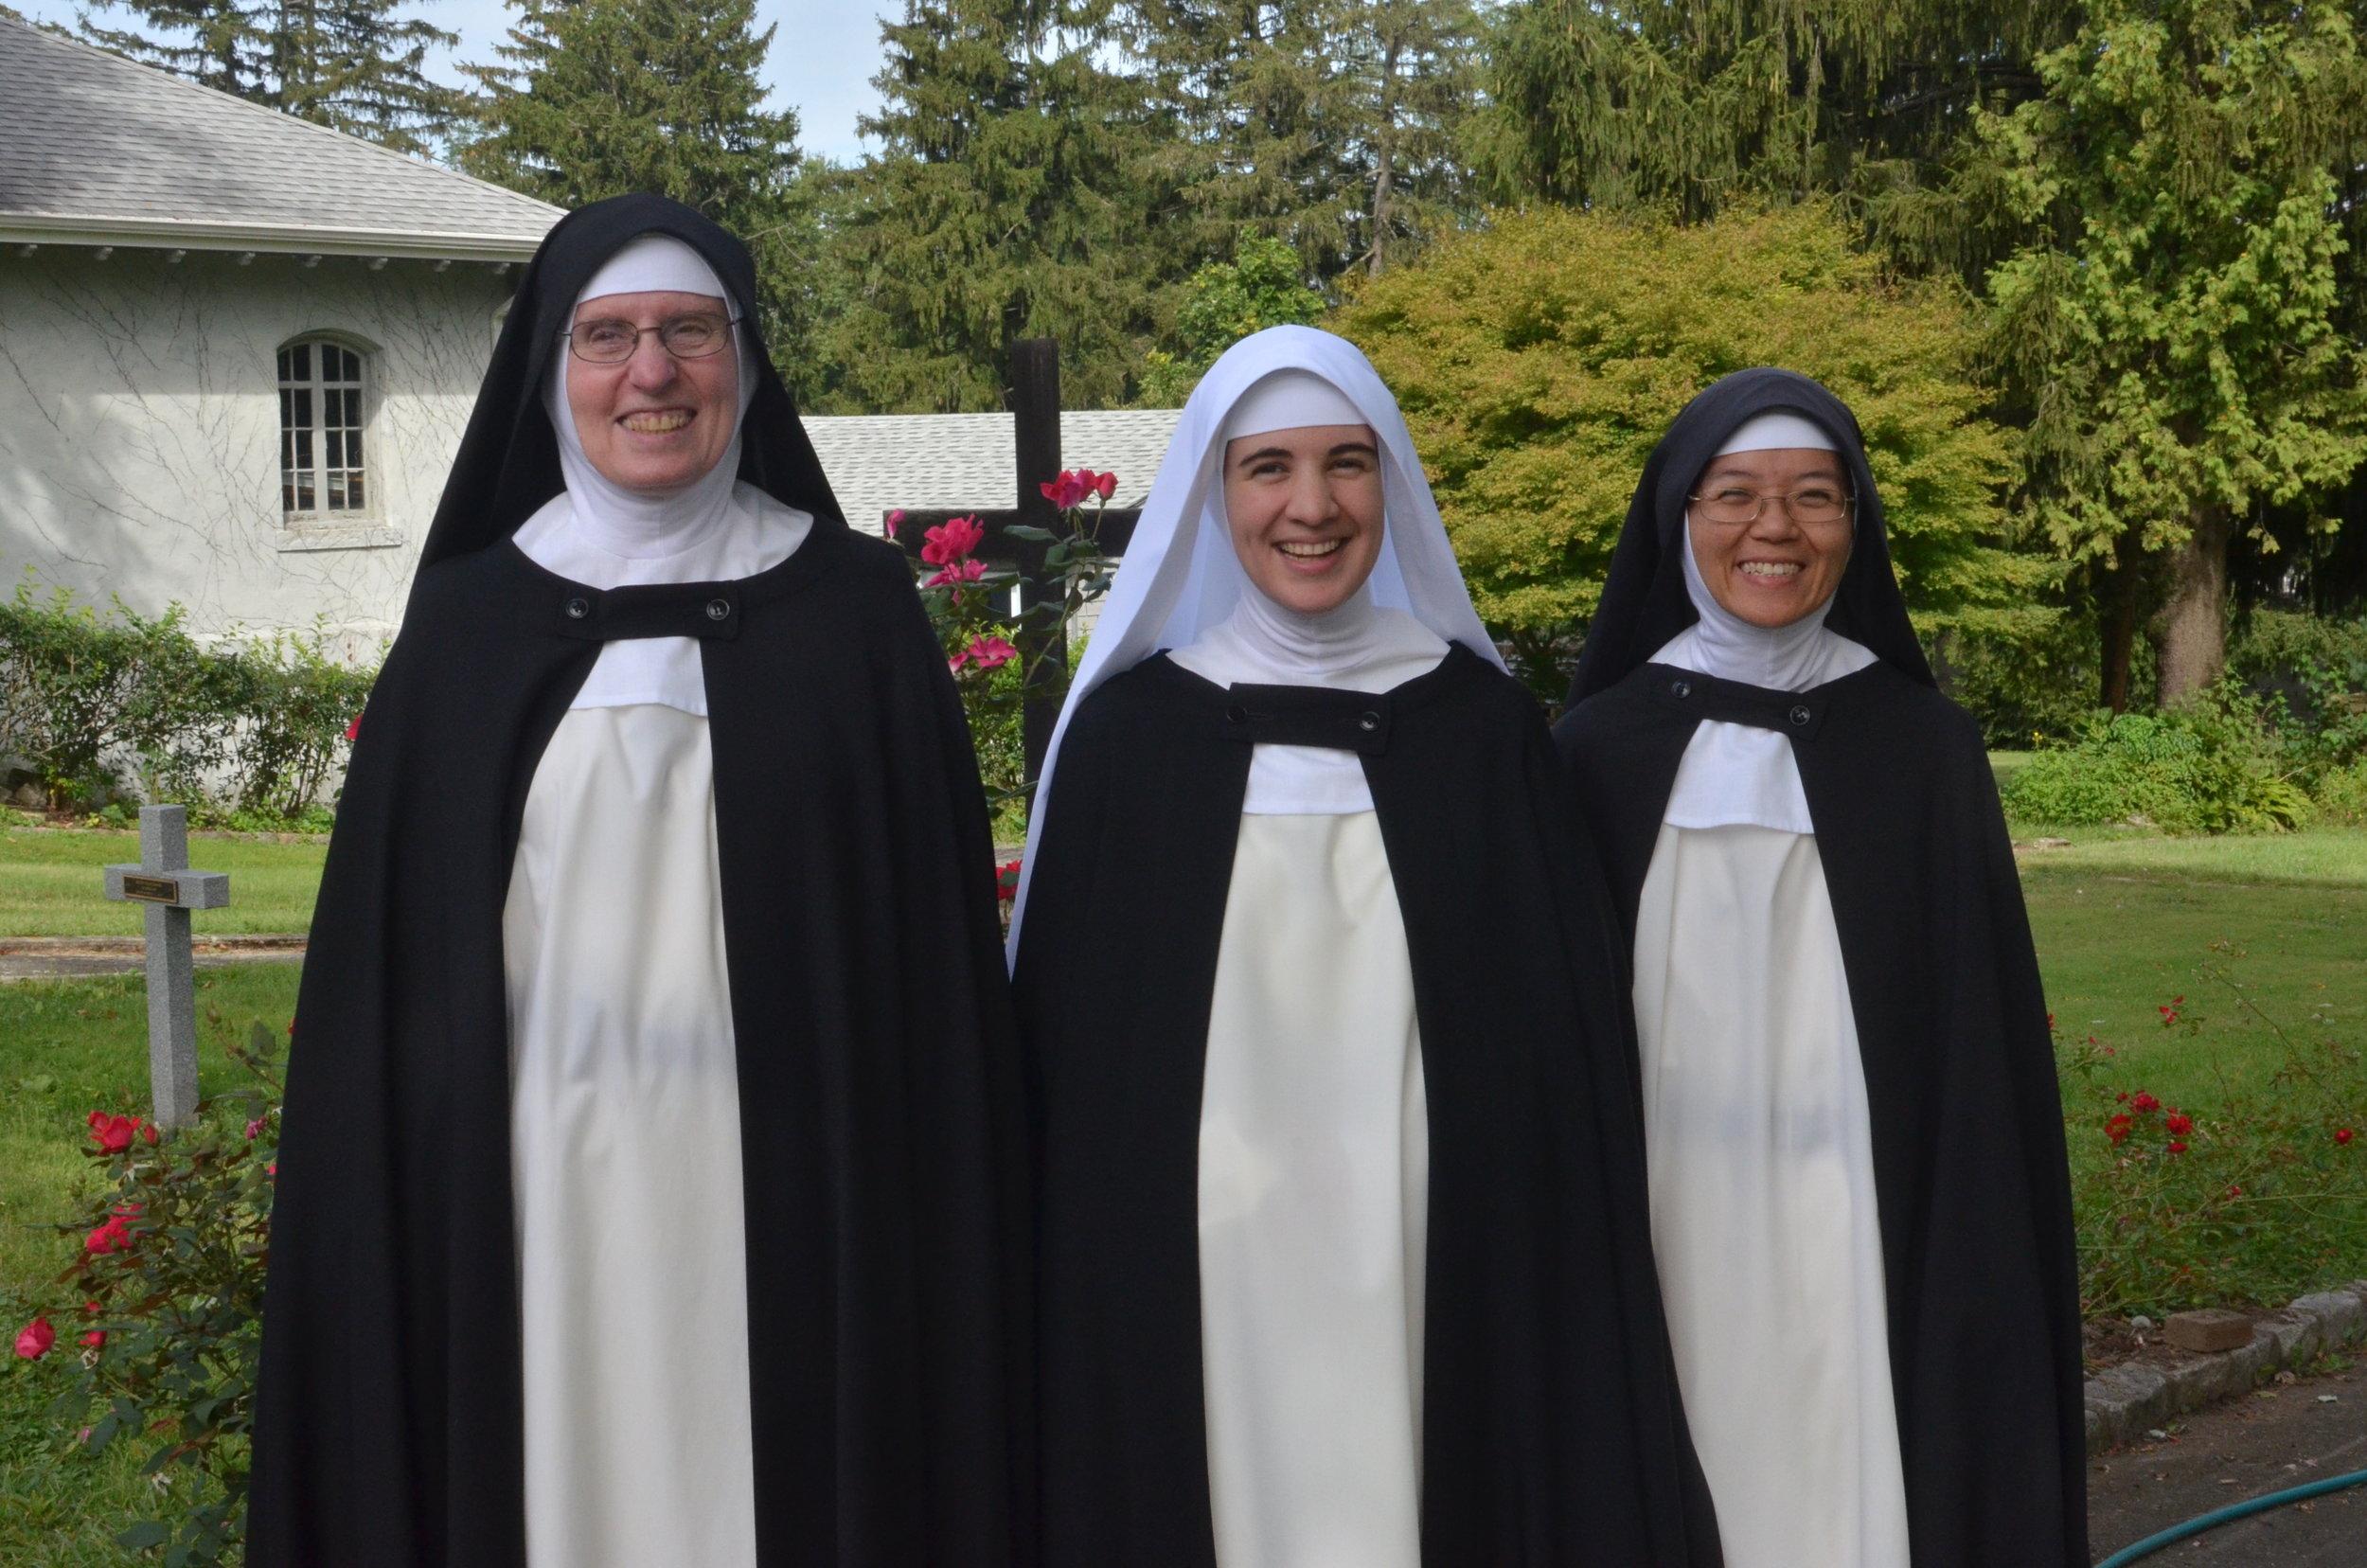 With Sr. Mary Martin, prioress and Sr. Joseph Maria, novice mistress